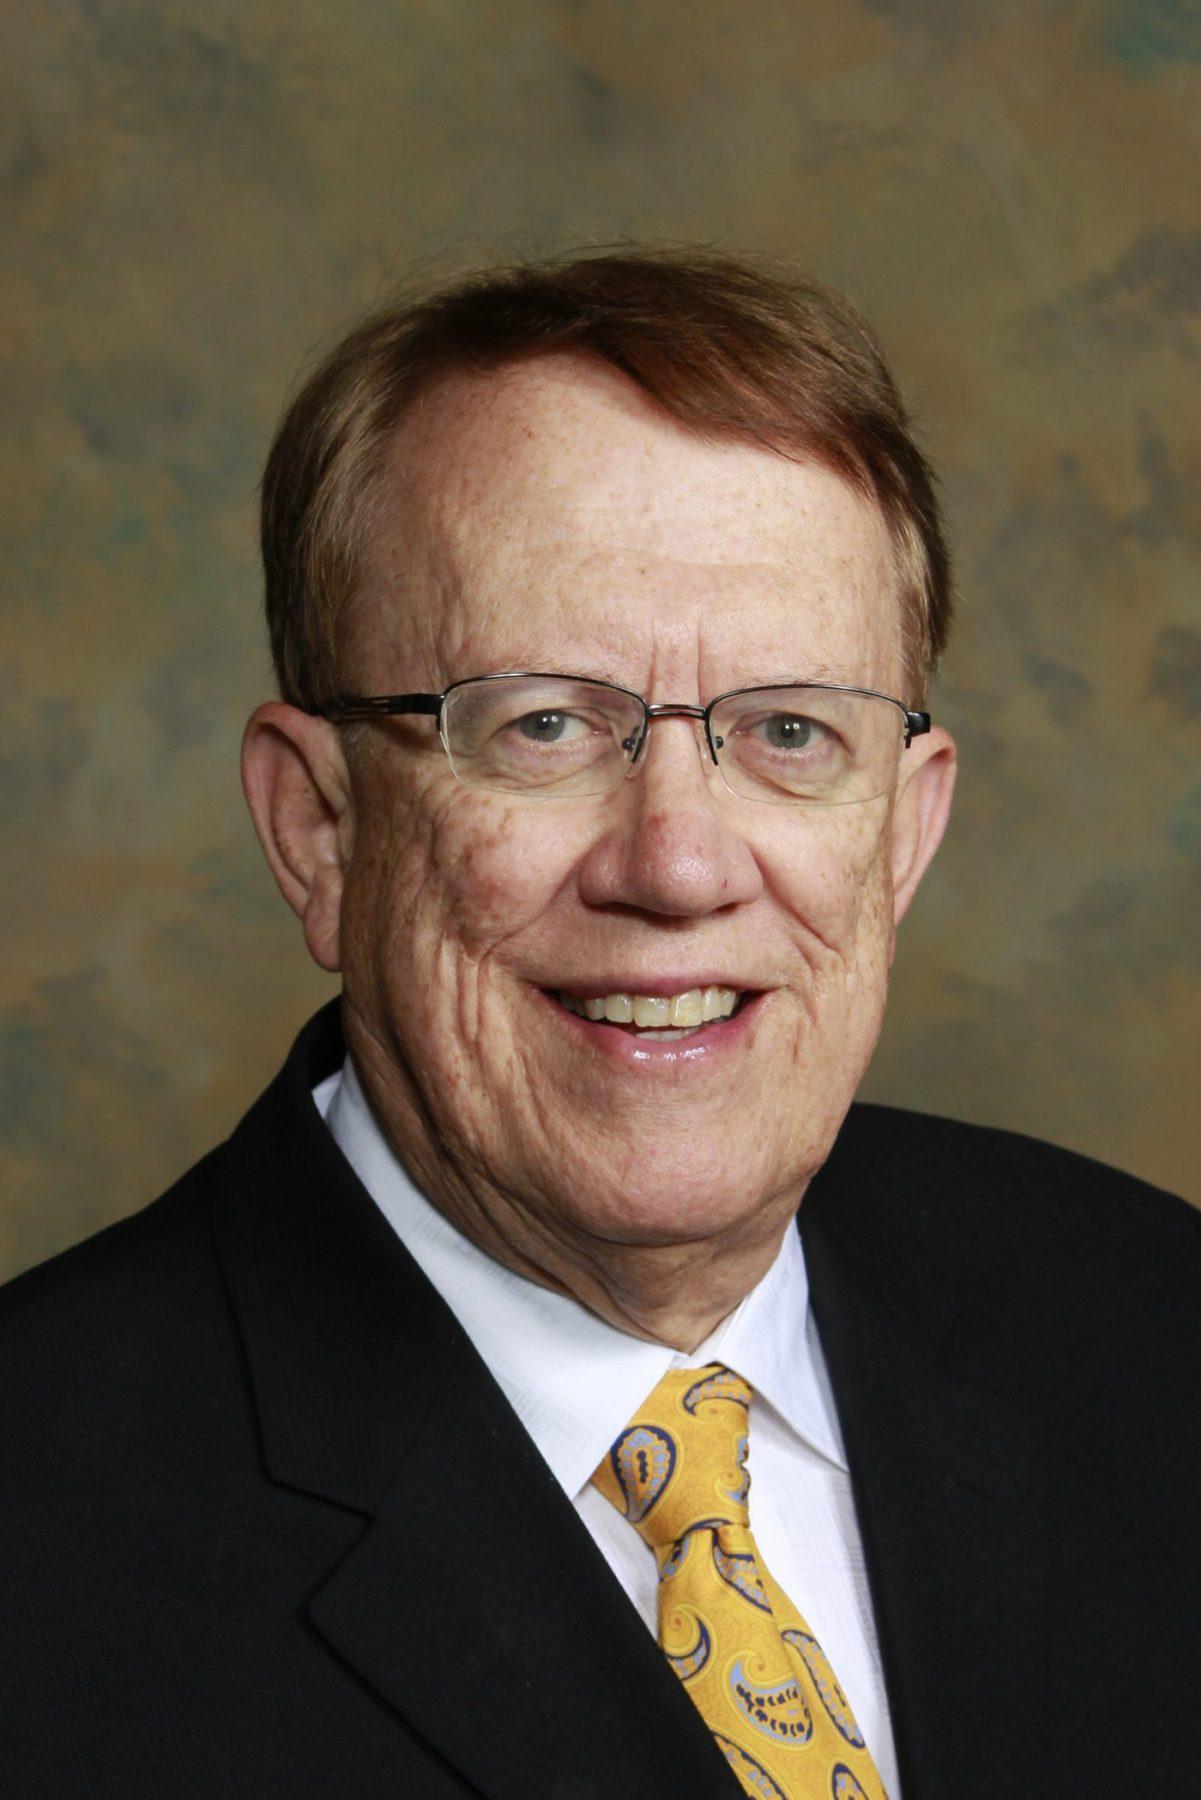 Dr. Newman Crenshaw Community Urologist